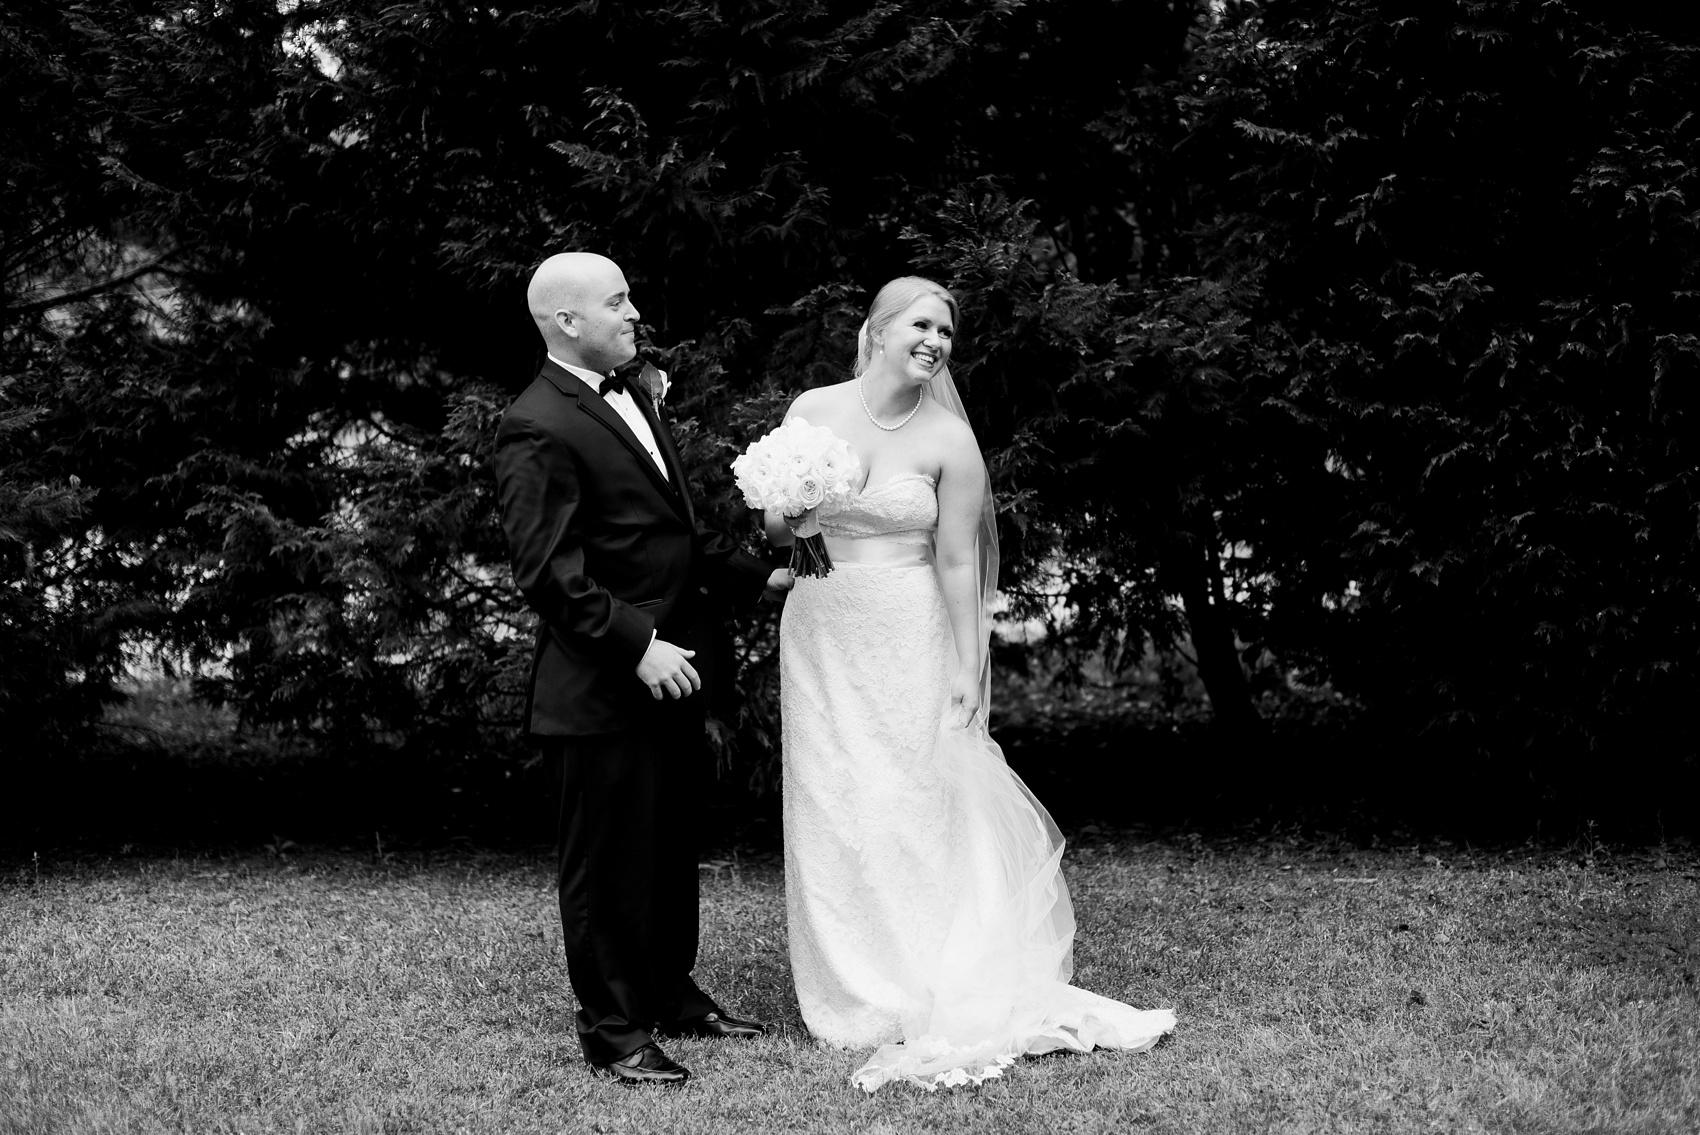 lexington_wedding_photographer_0134.jpg